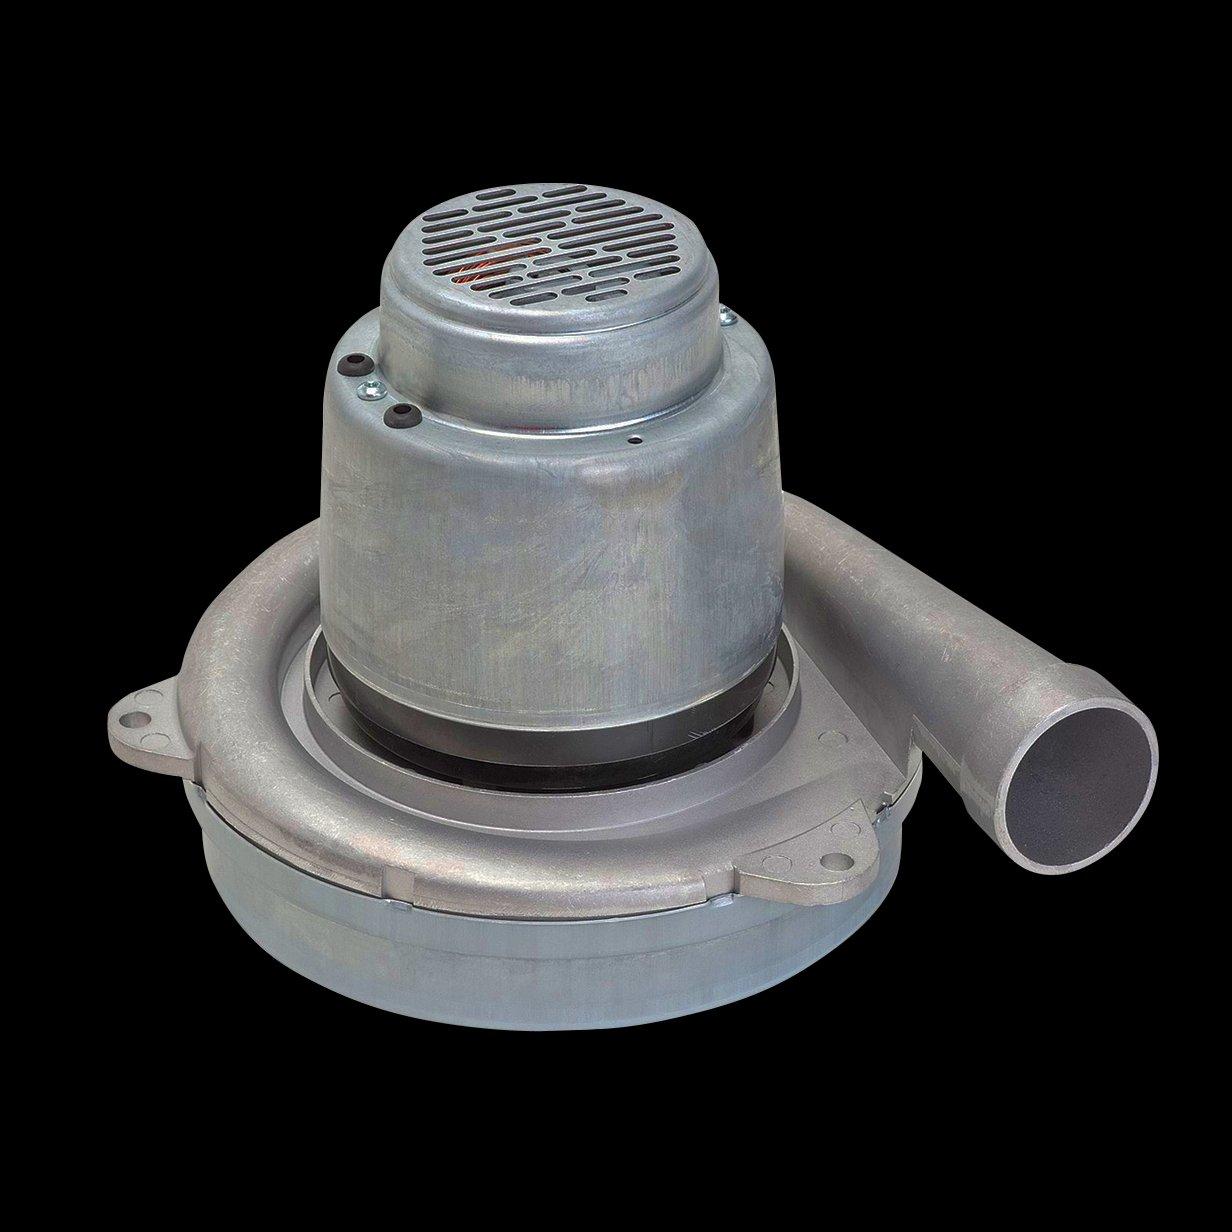 Image of Internal Gears AMETEK LAMB, 122177-00, Vacuum Mtr/Blwr, Tangential, 2 Stge, 1 SPD